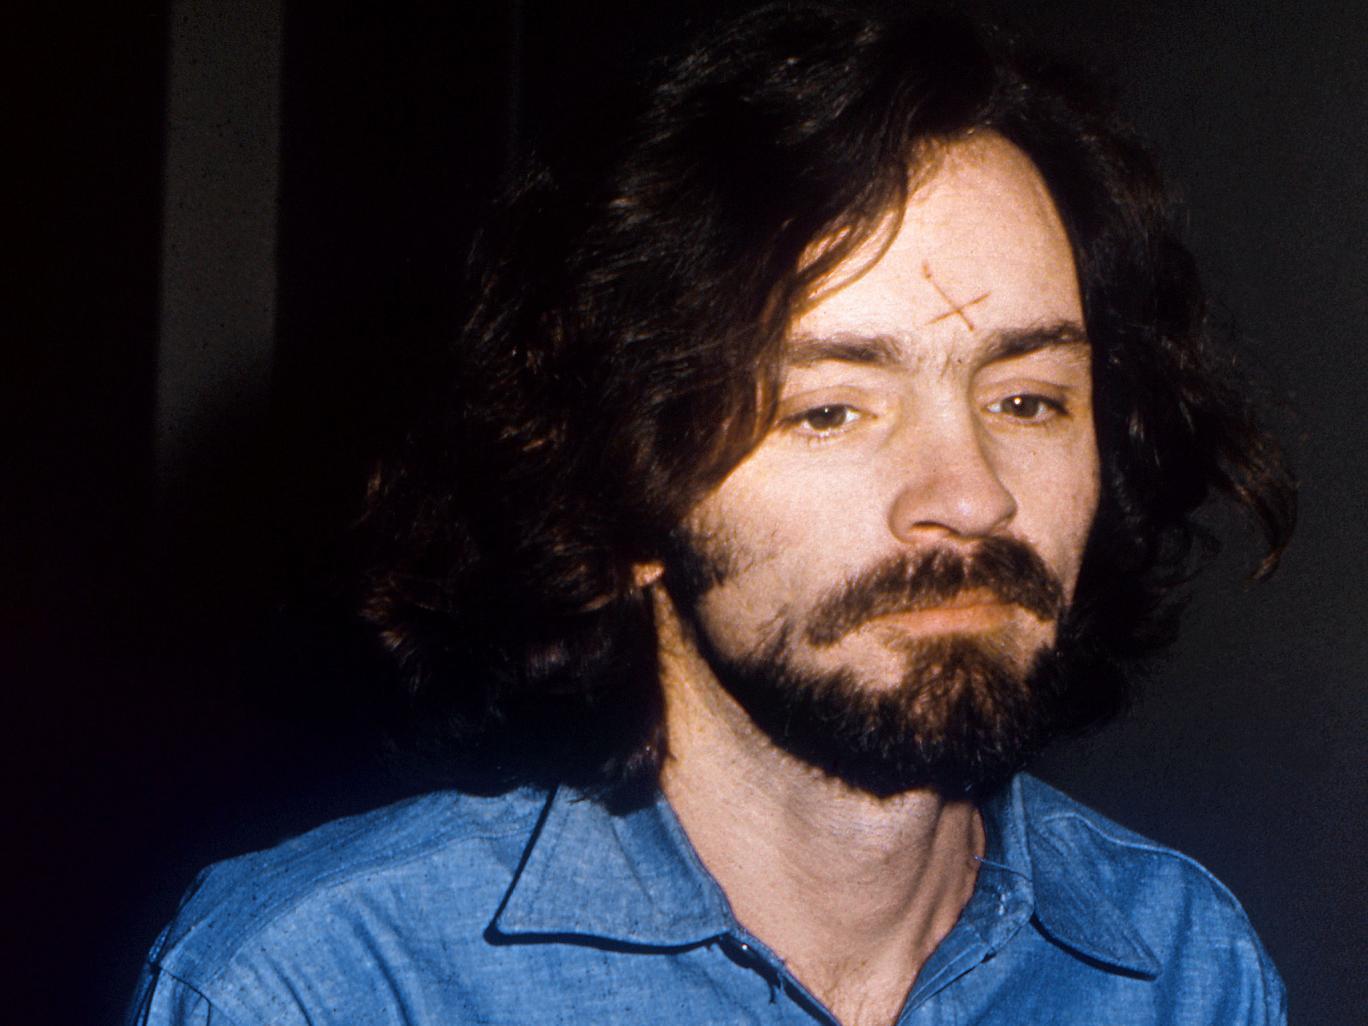 Murderer Charles Manson in 1970